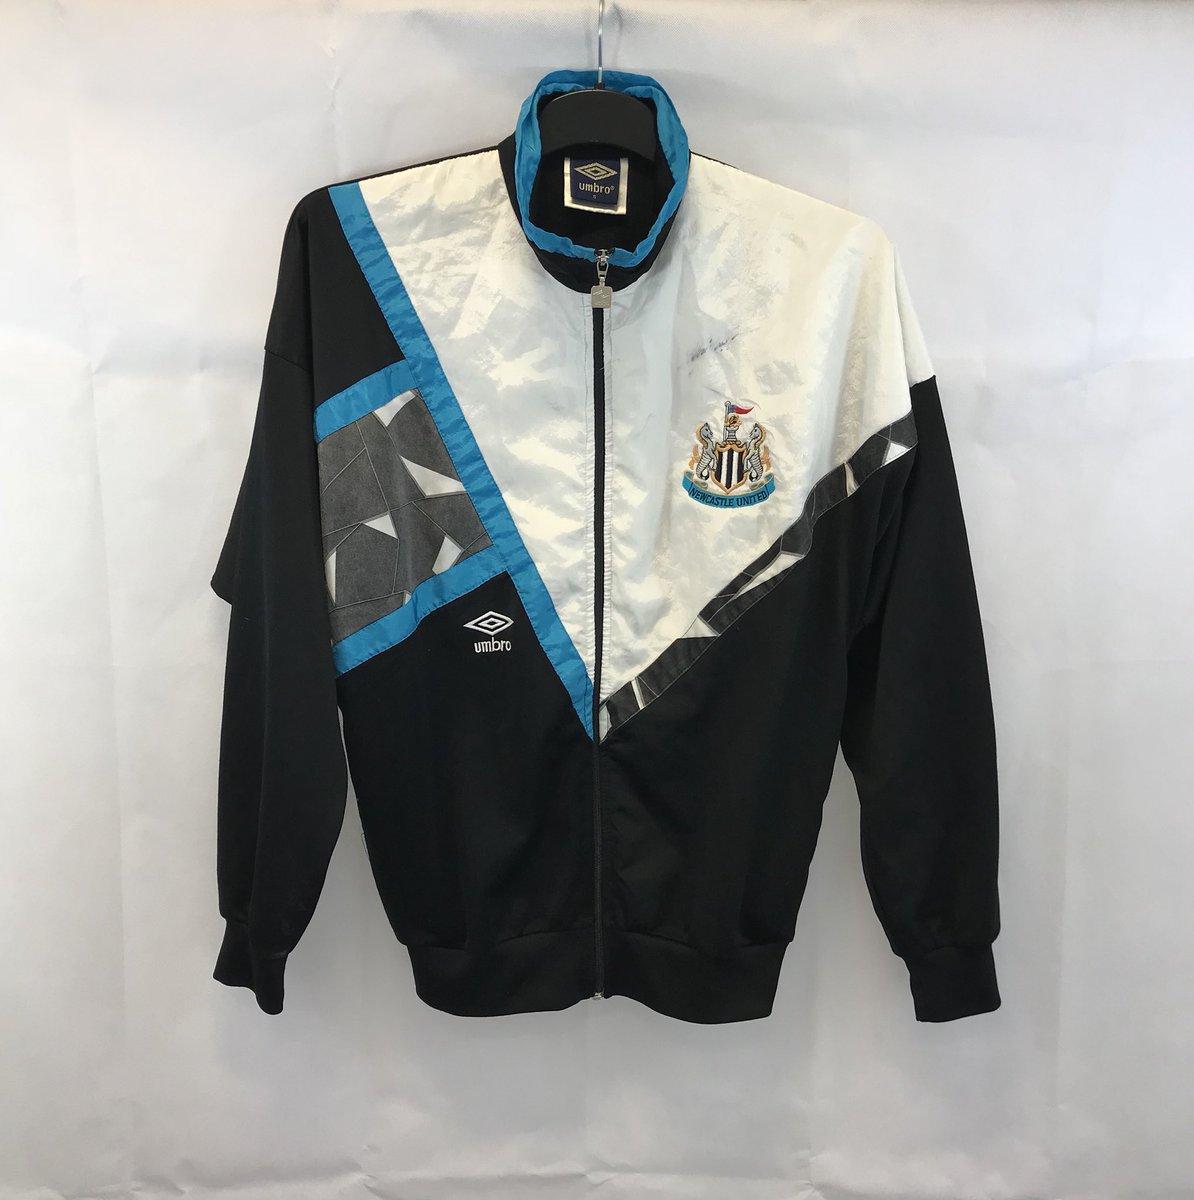 4297d8be4 ... Football Jacket 1988/90 Adults Small Umbro  http://historicfootballshirts.co.uk/shop/newcastle-united-track-football-jacket-1988-90-adults-small- umbro/ …